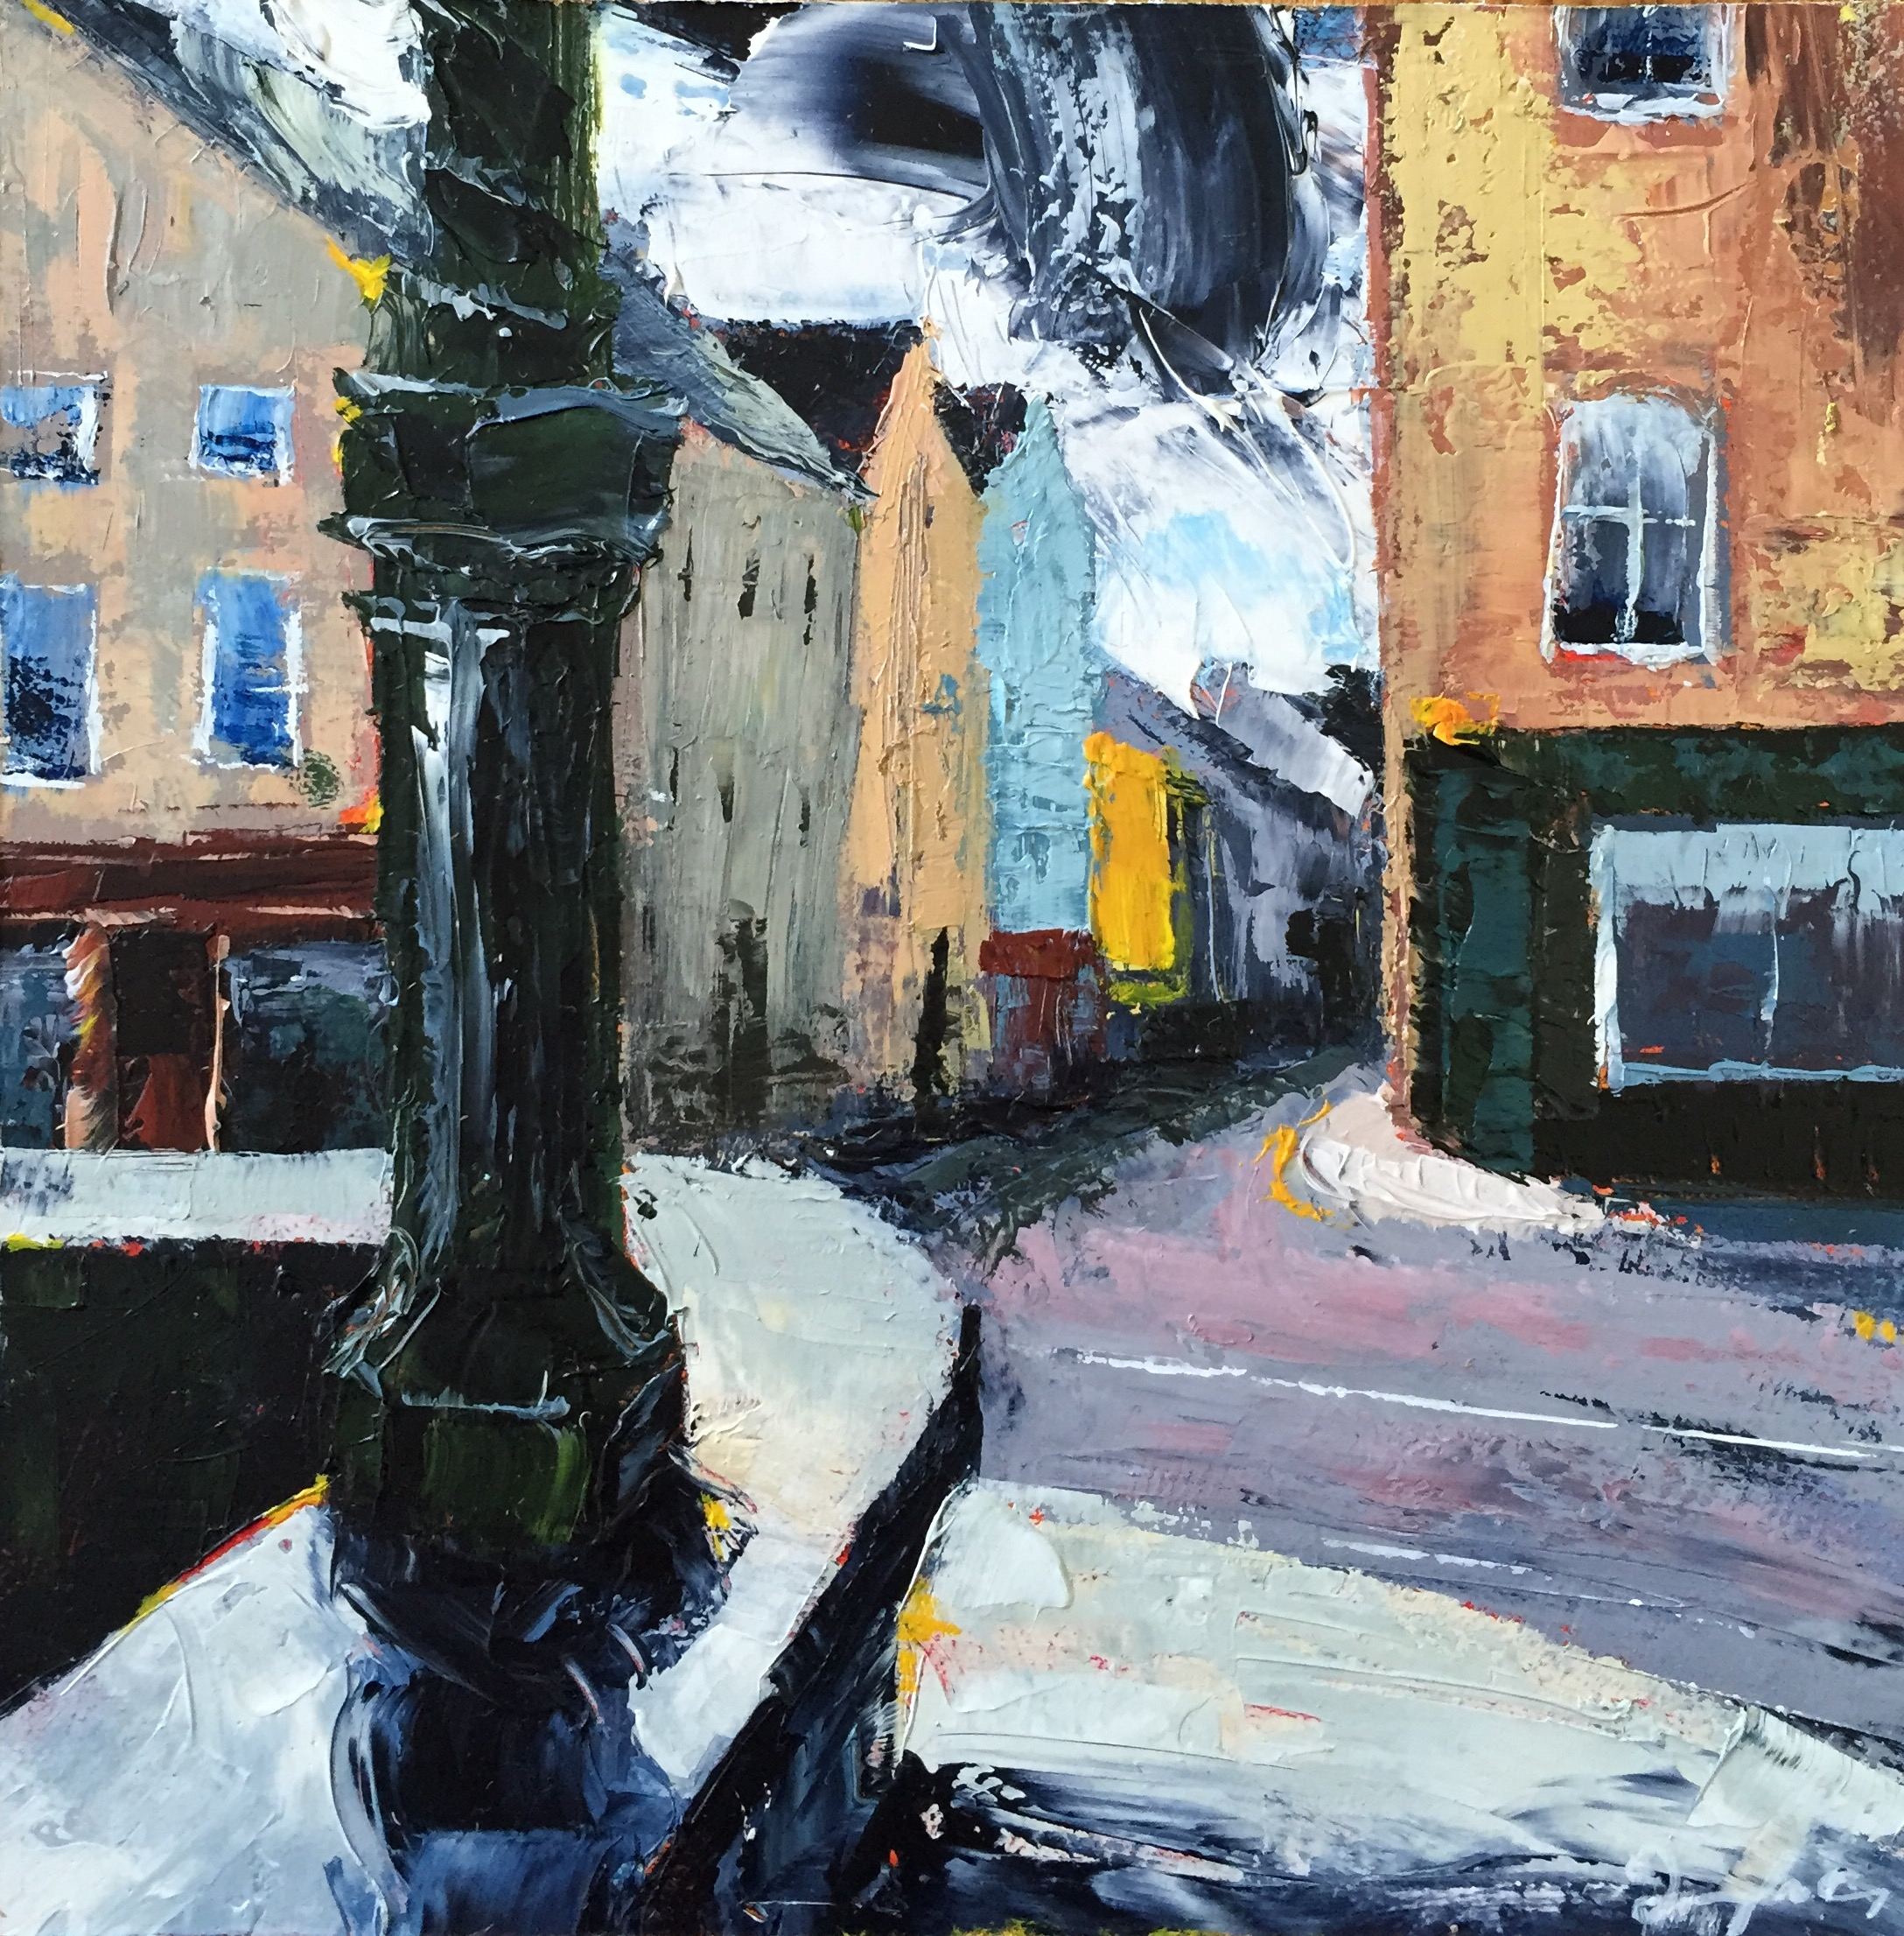 Donagh_Carey_artist-Marys-street-meets-sullivans-quay.jpg